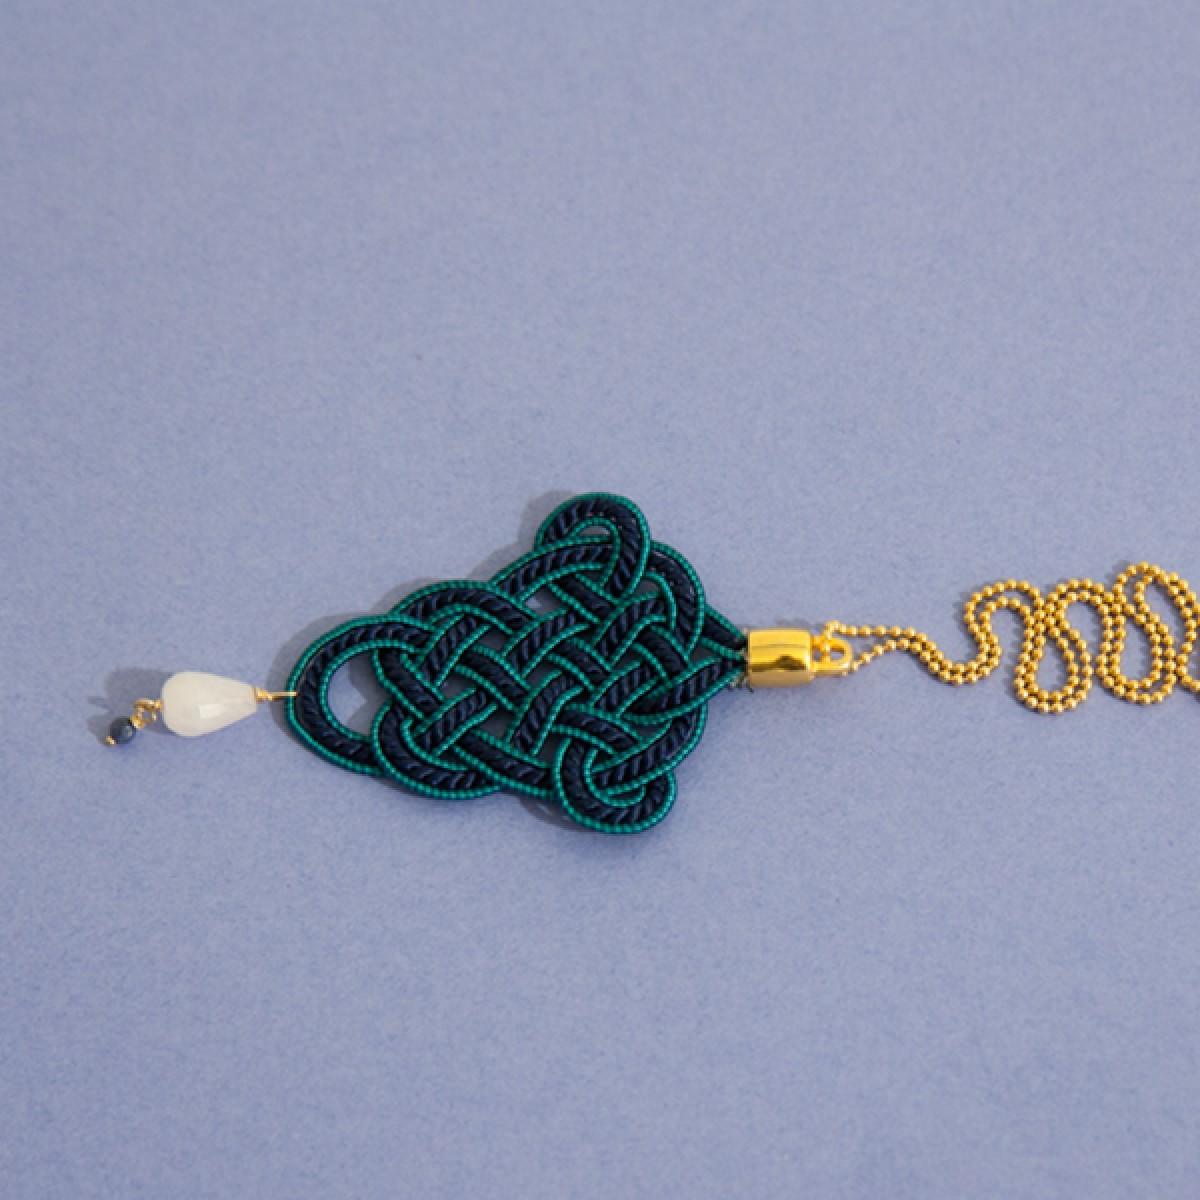 Irmeline - Accessoires Manufaktur »Posamente« Kette in blau & turkies